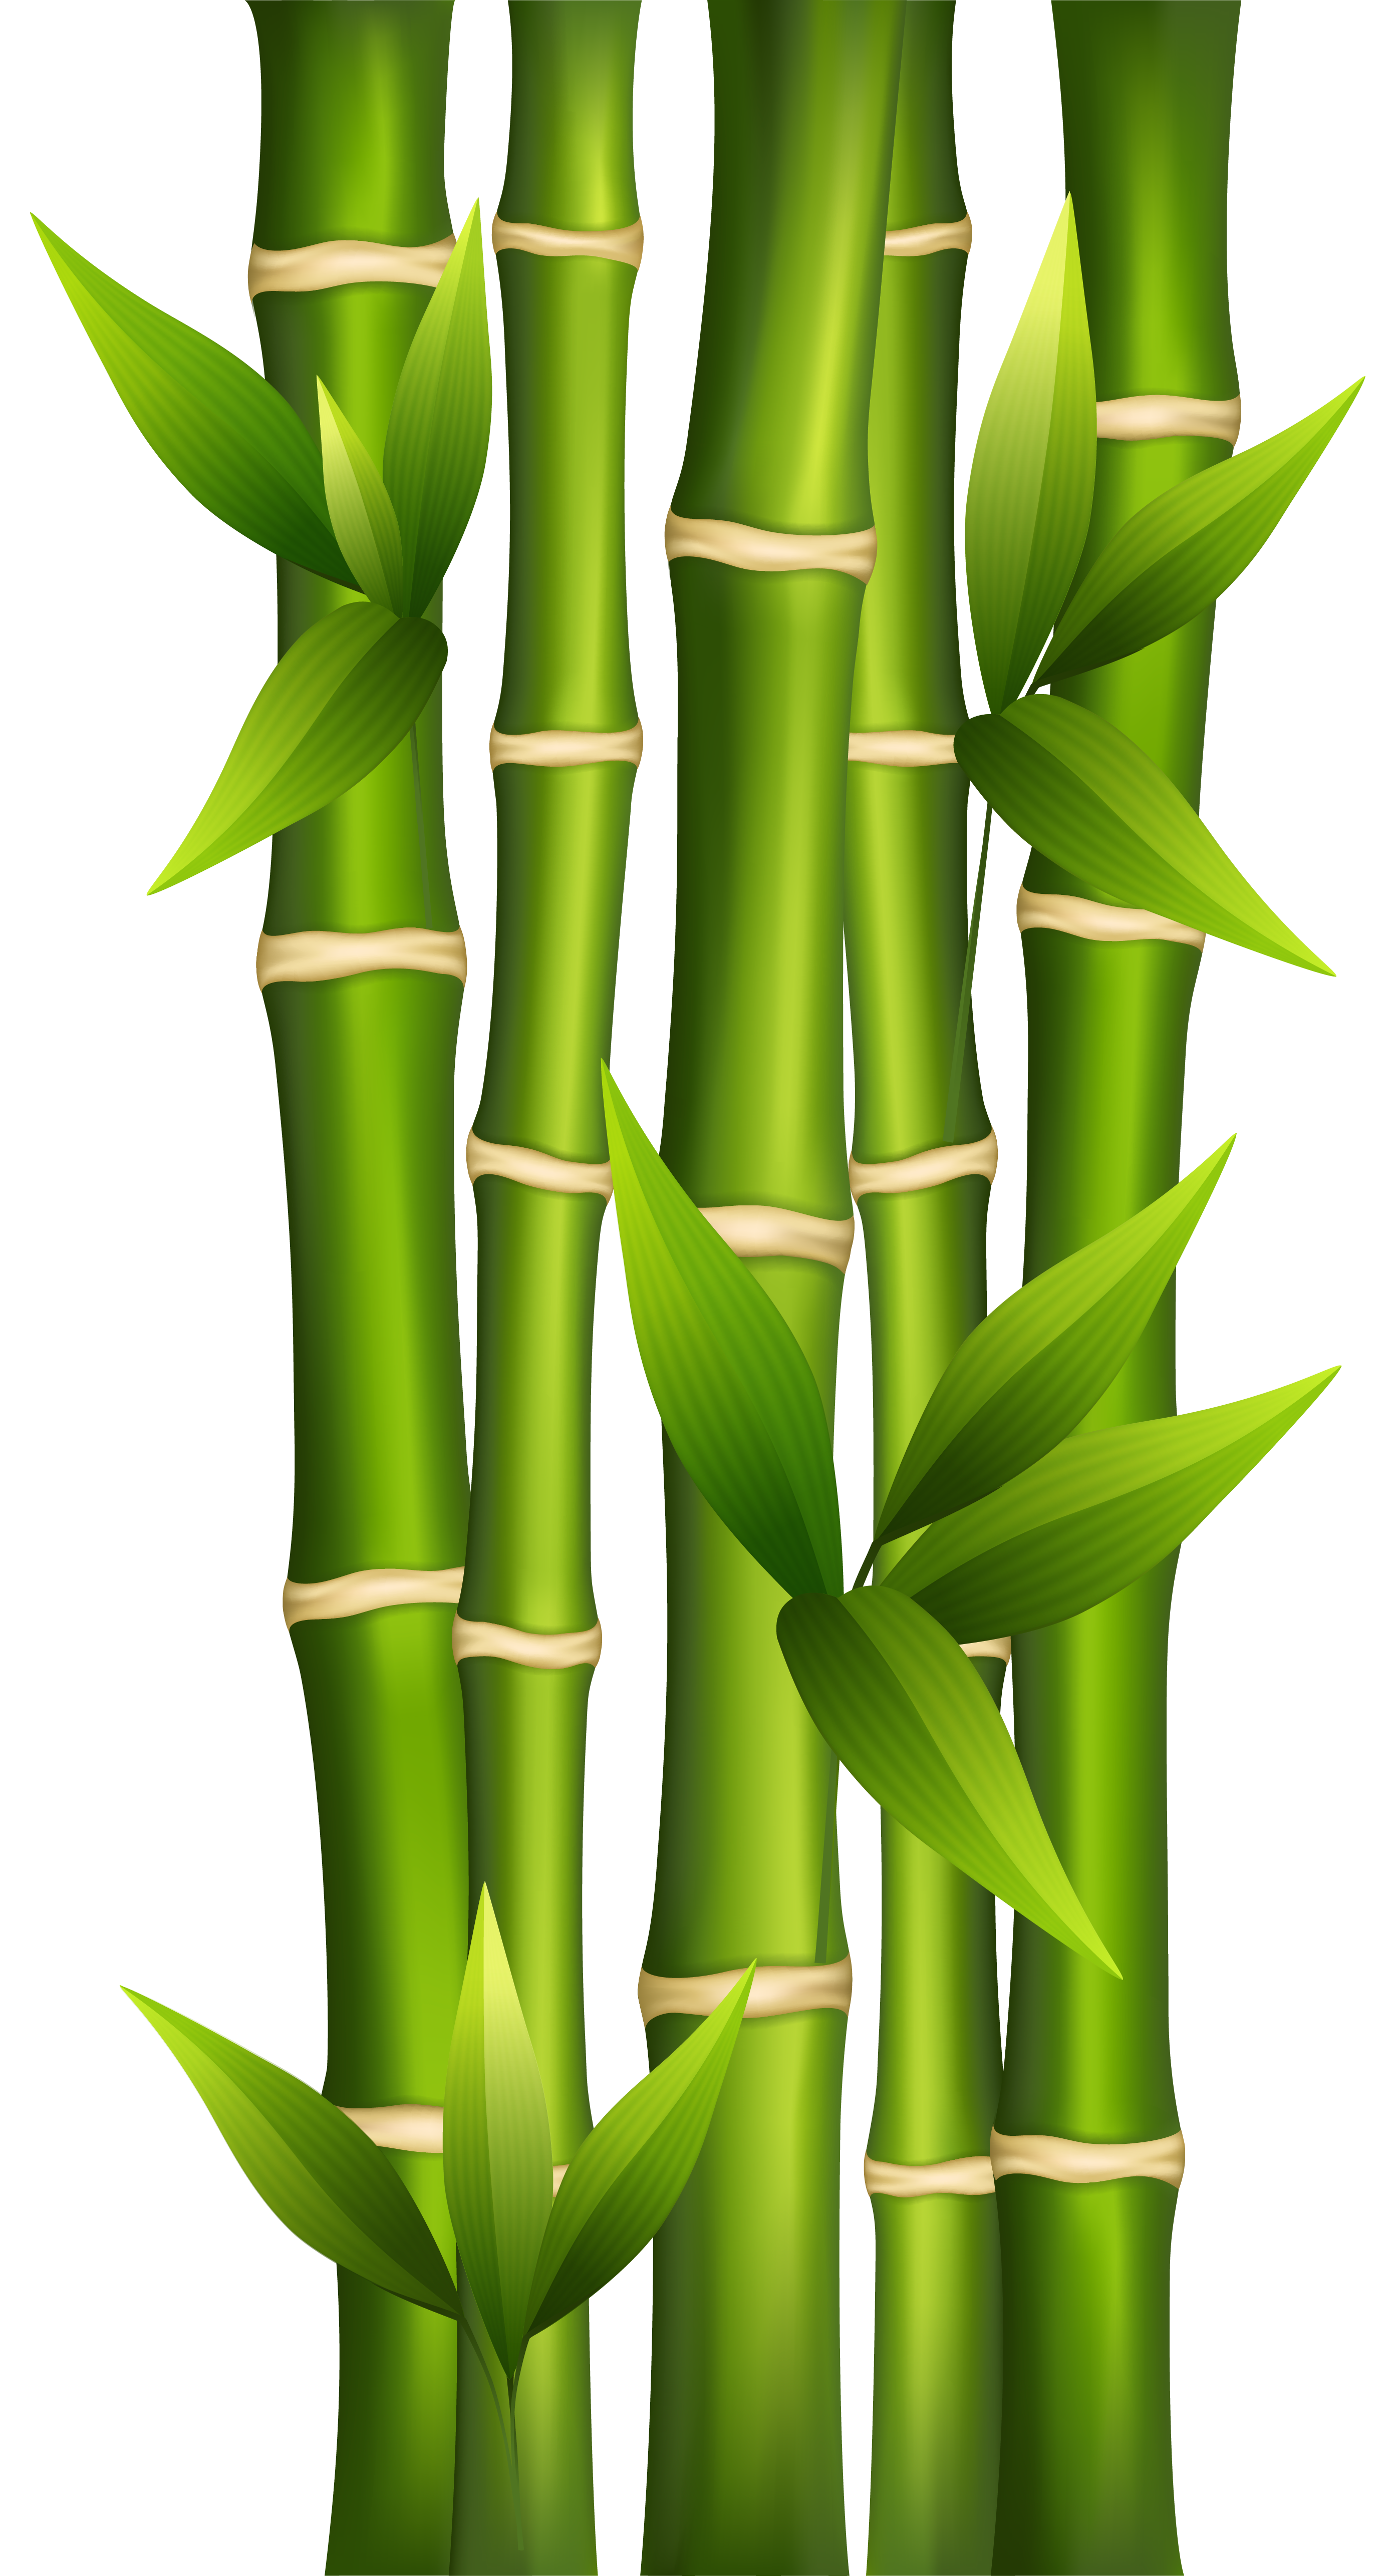 bamboo png clipart image | bamboo drawing, bamboo art, bamboo background  pinterest